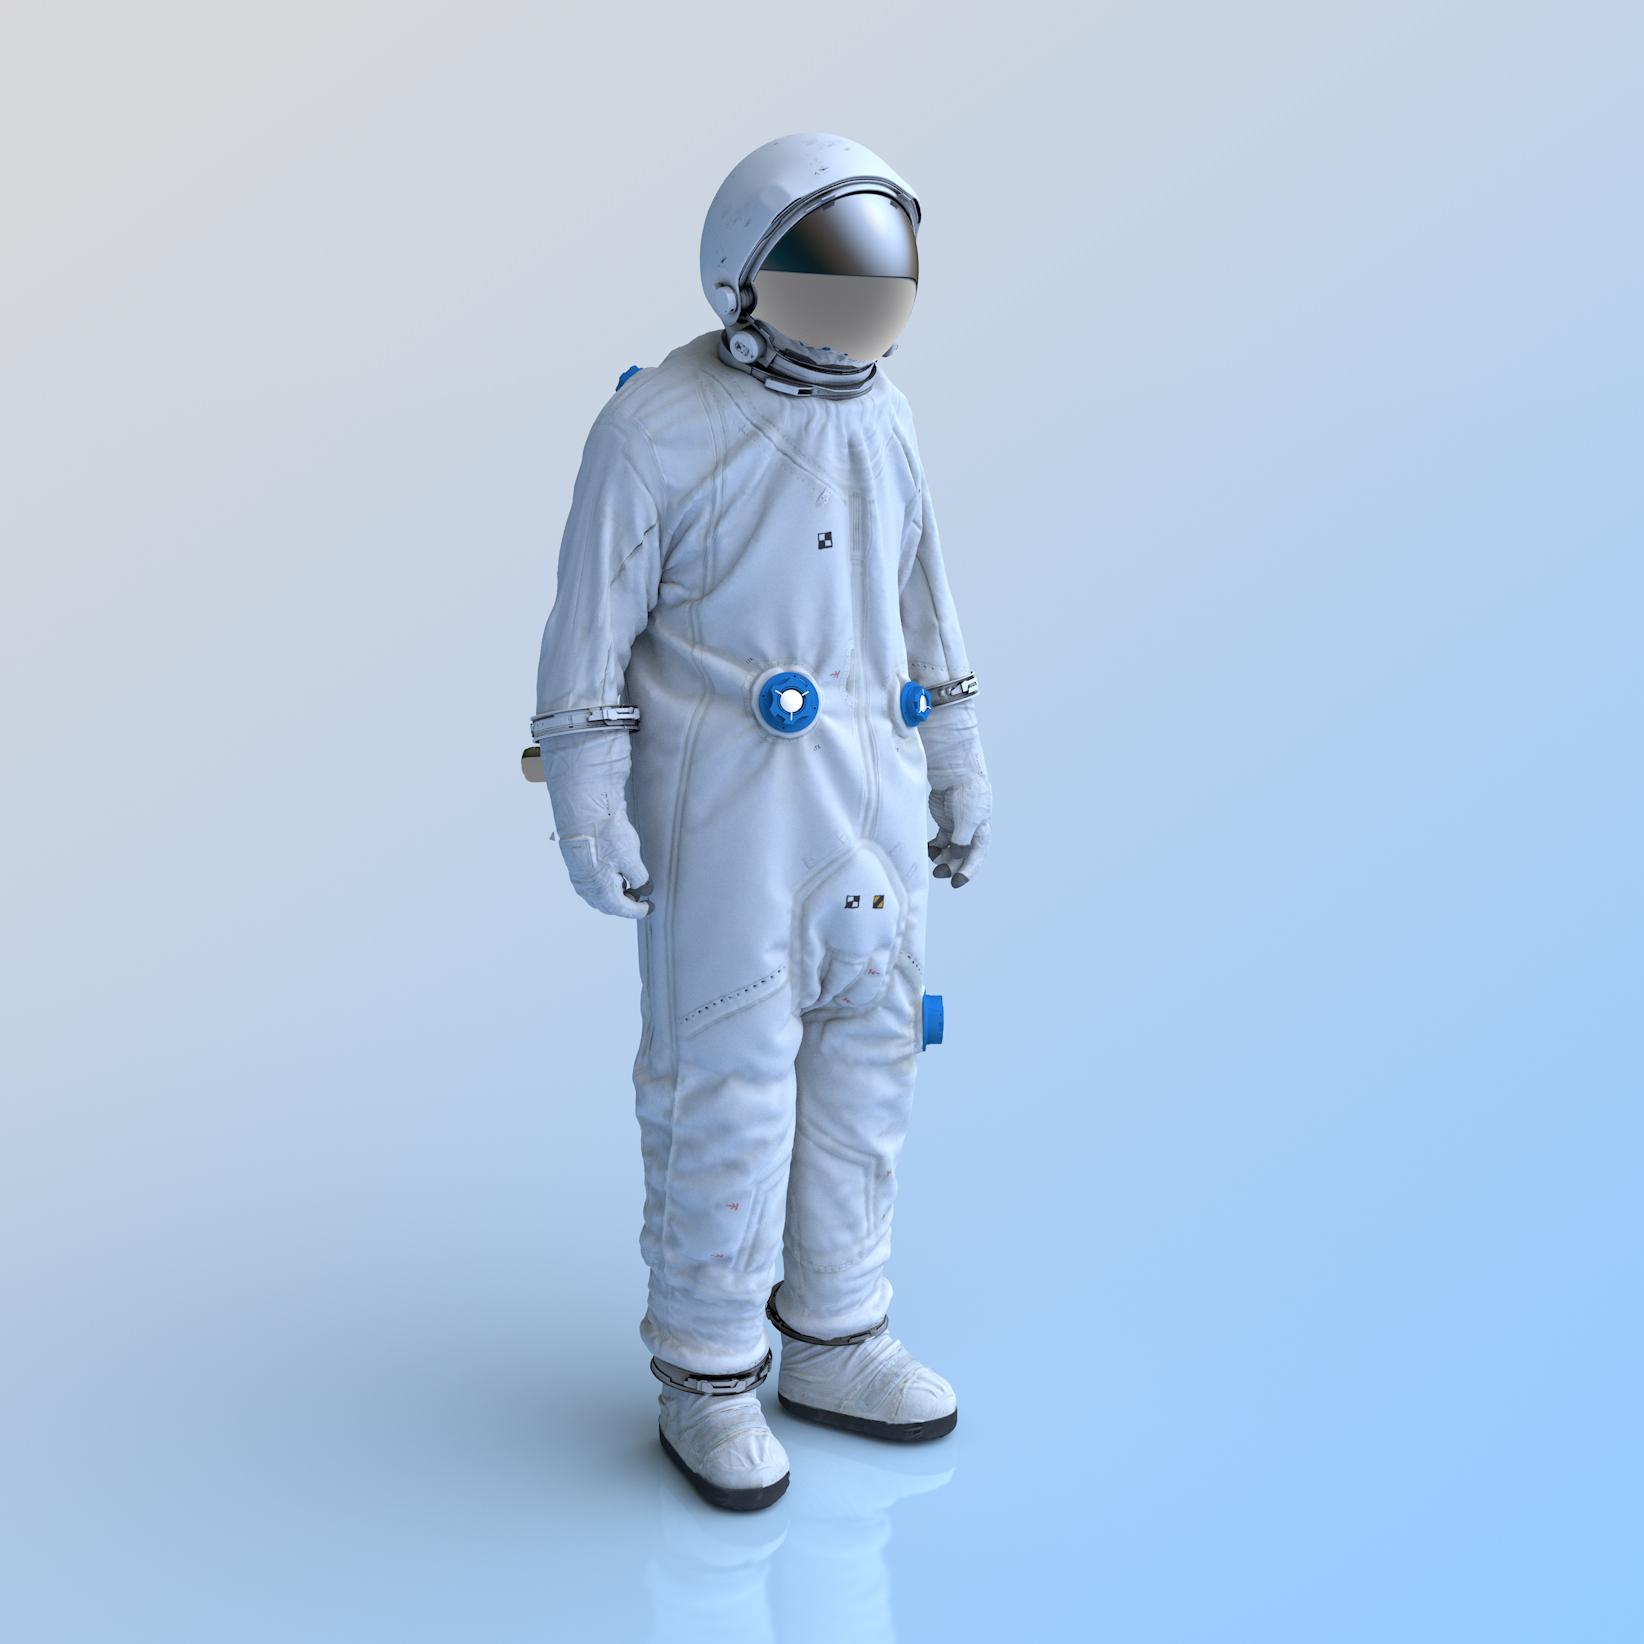 Astronaut_b